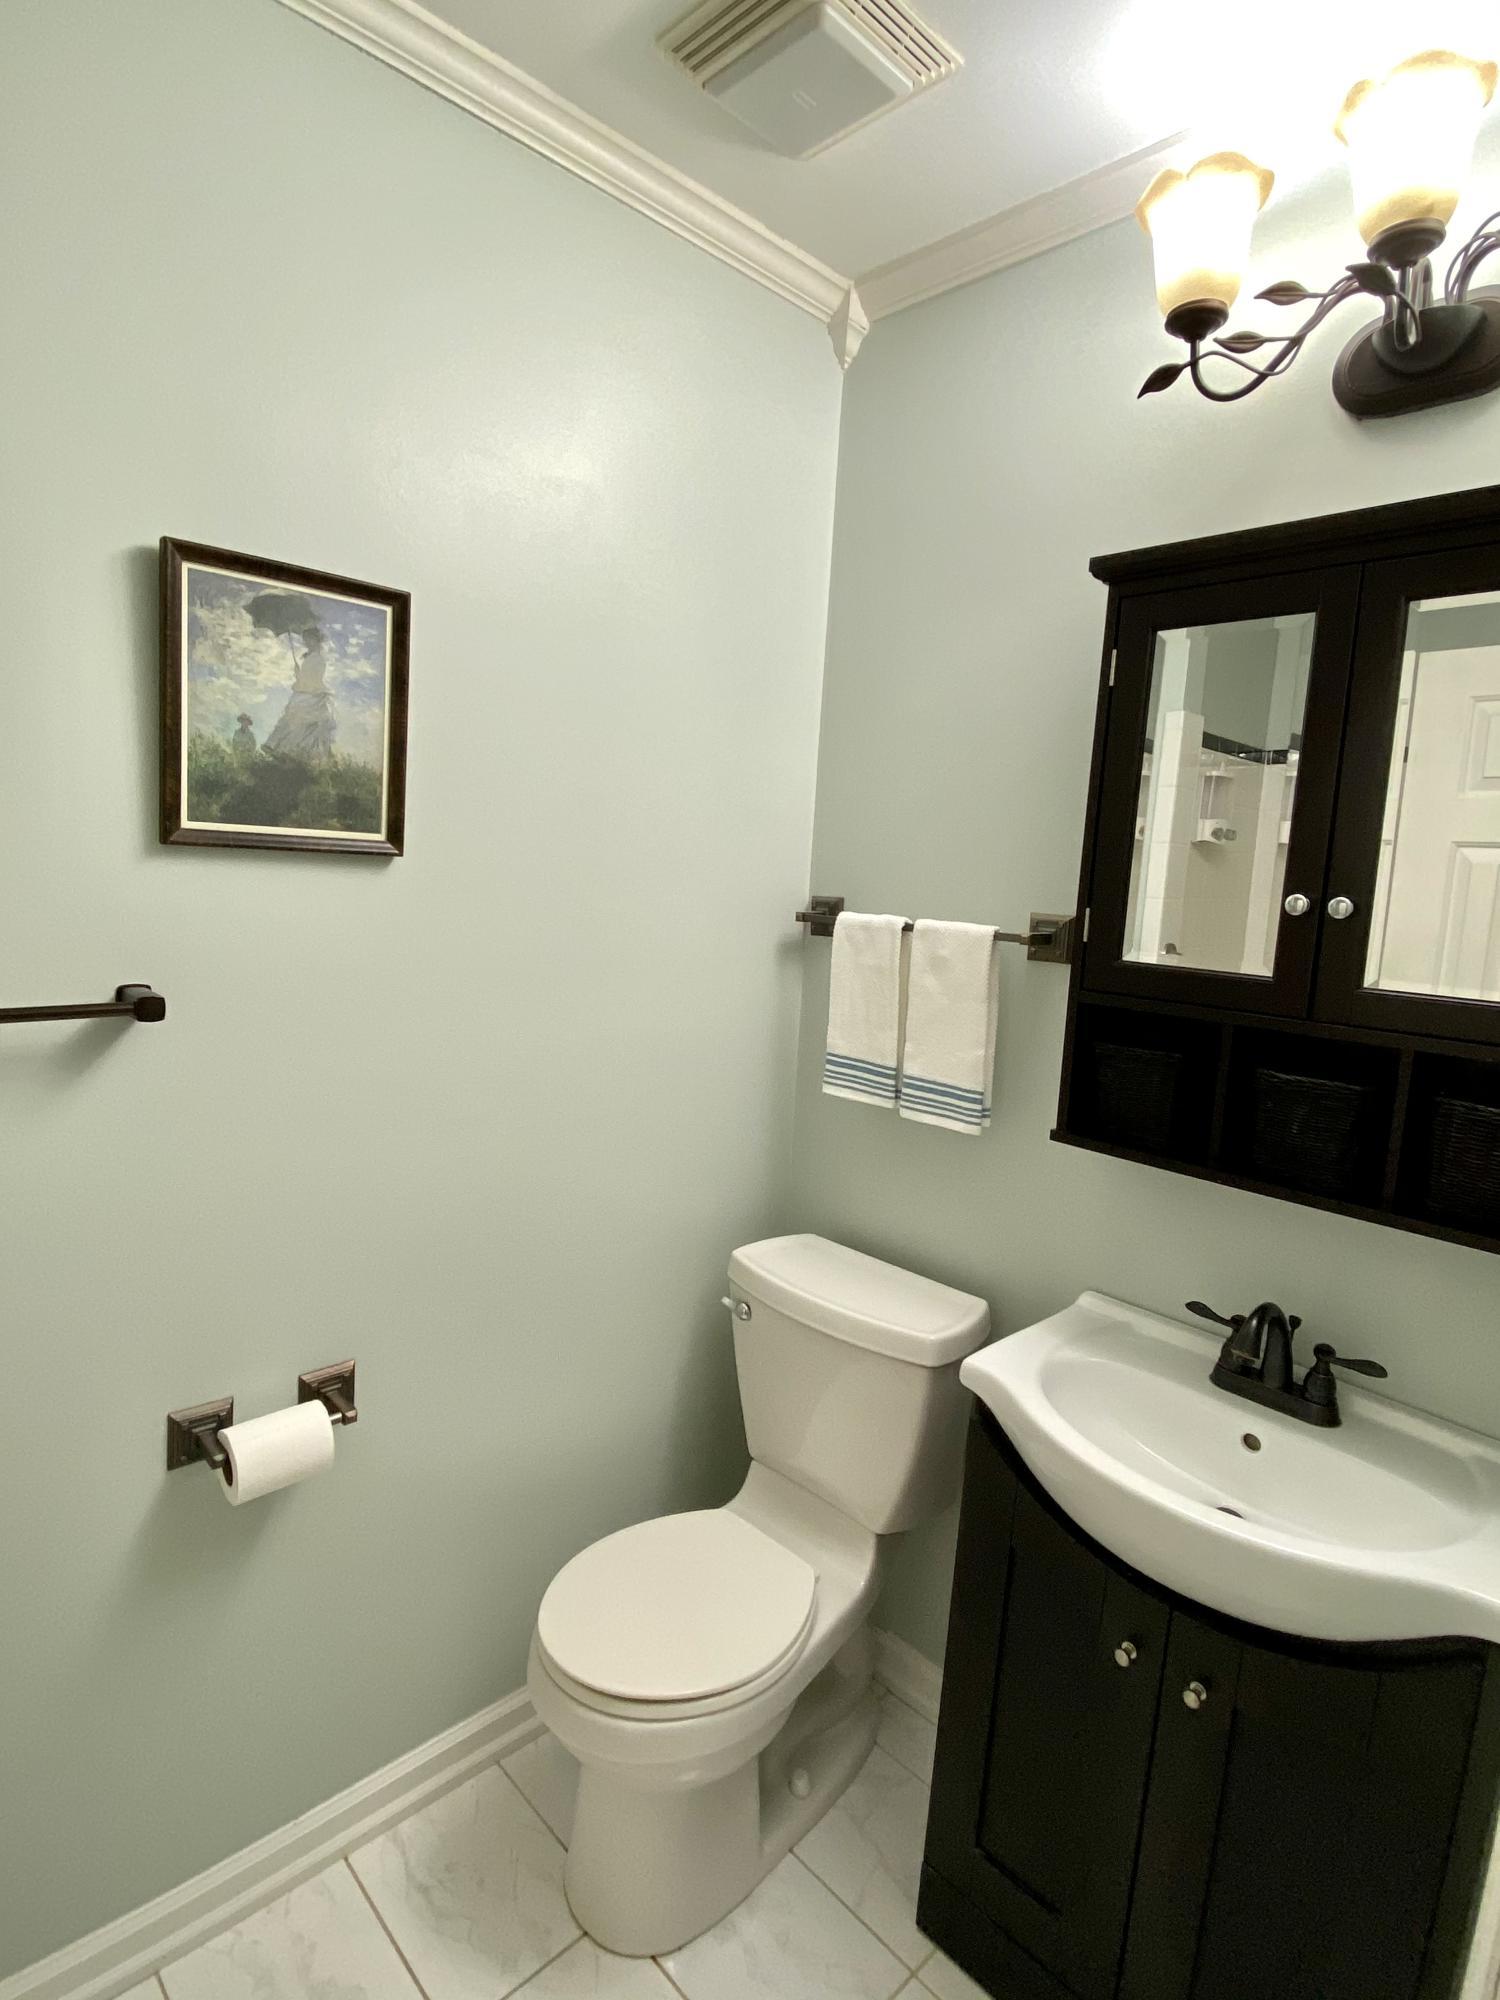 Palmetto Fort Homes For Sale - 1510 Lakeshore, Mount Pleasant, SC - 1